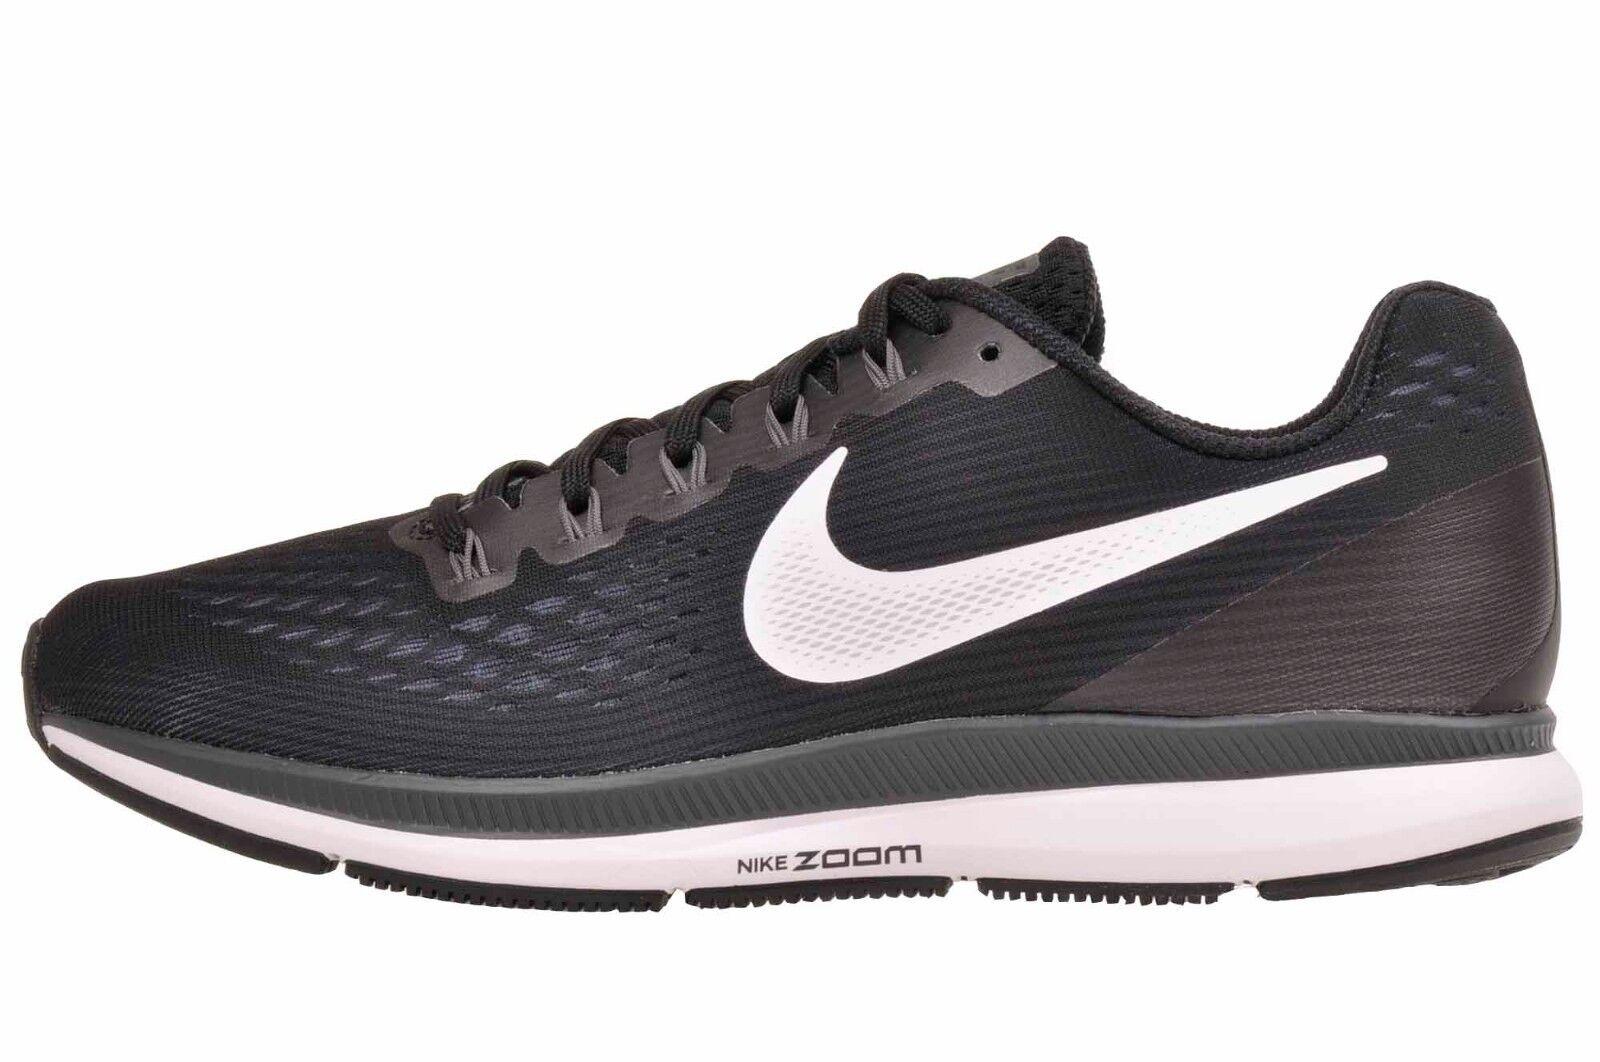 9ce21de950a Nike W Air Zoom Pegasus 34 Running Womens Shoes Black (Wide) 880561-001